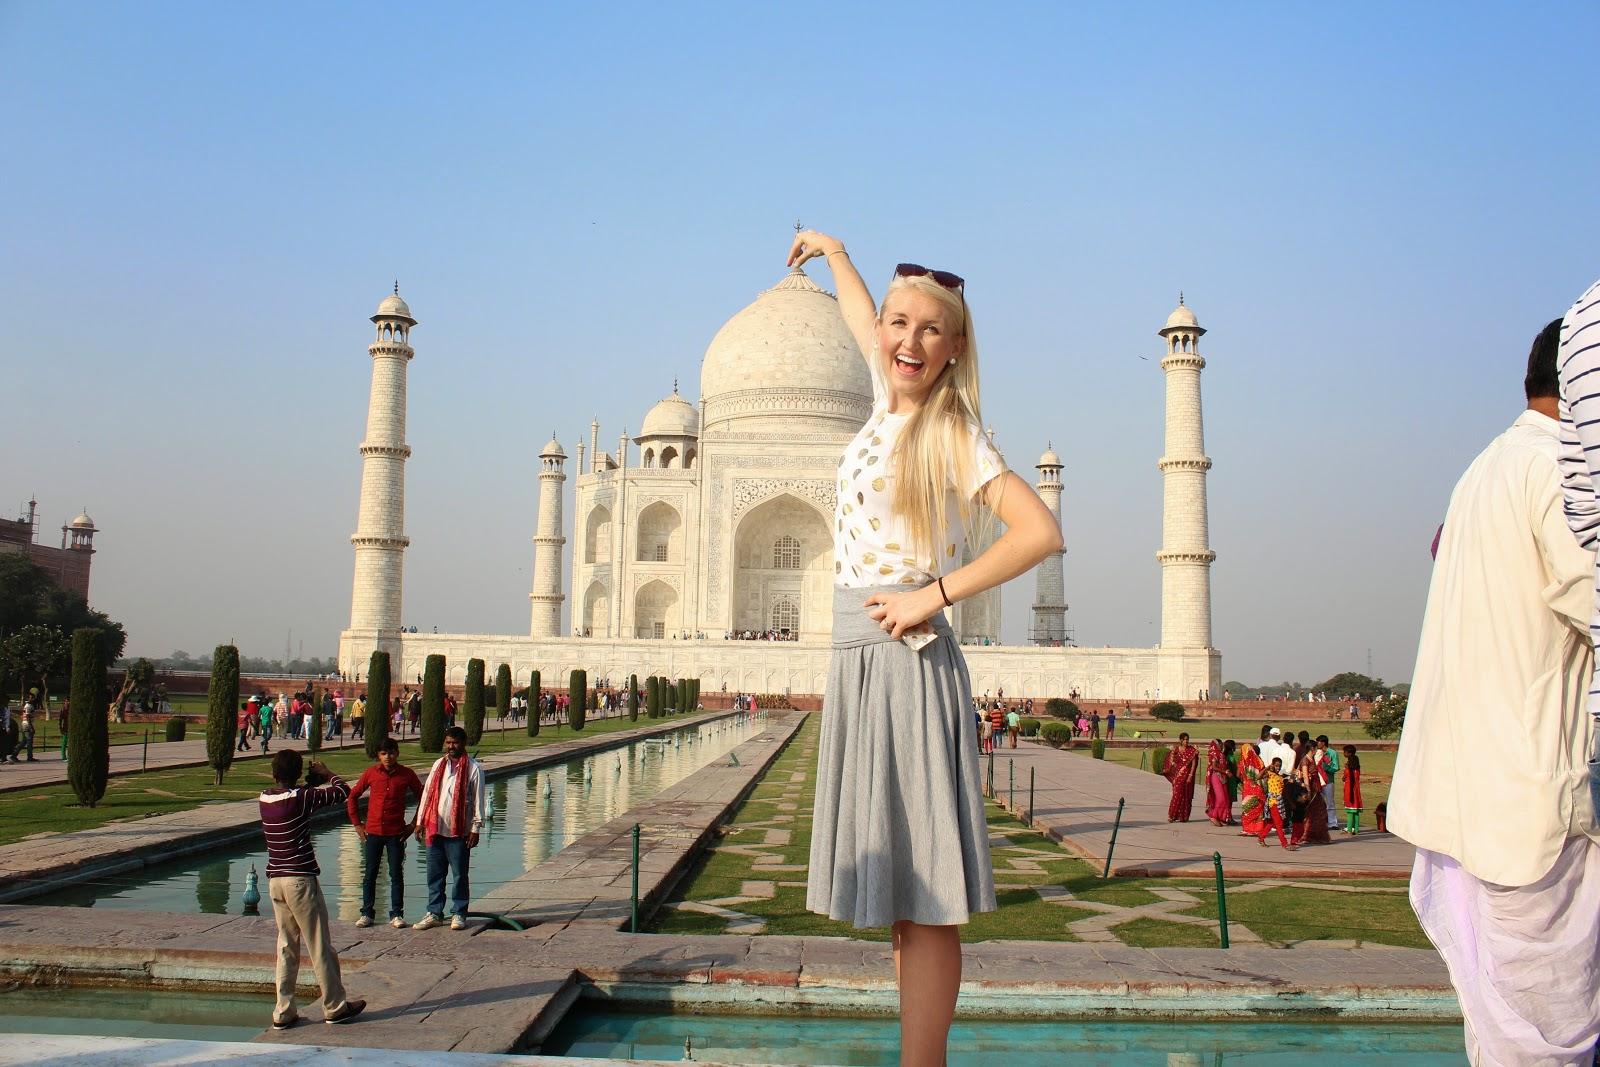 the taj mahal : one of the wonders of the world